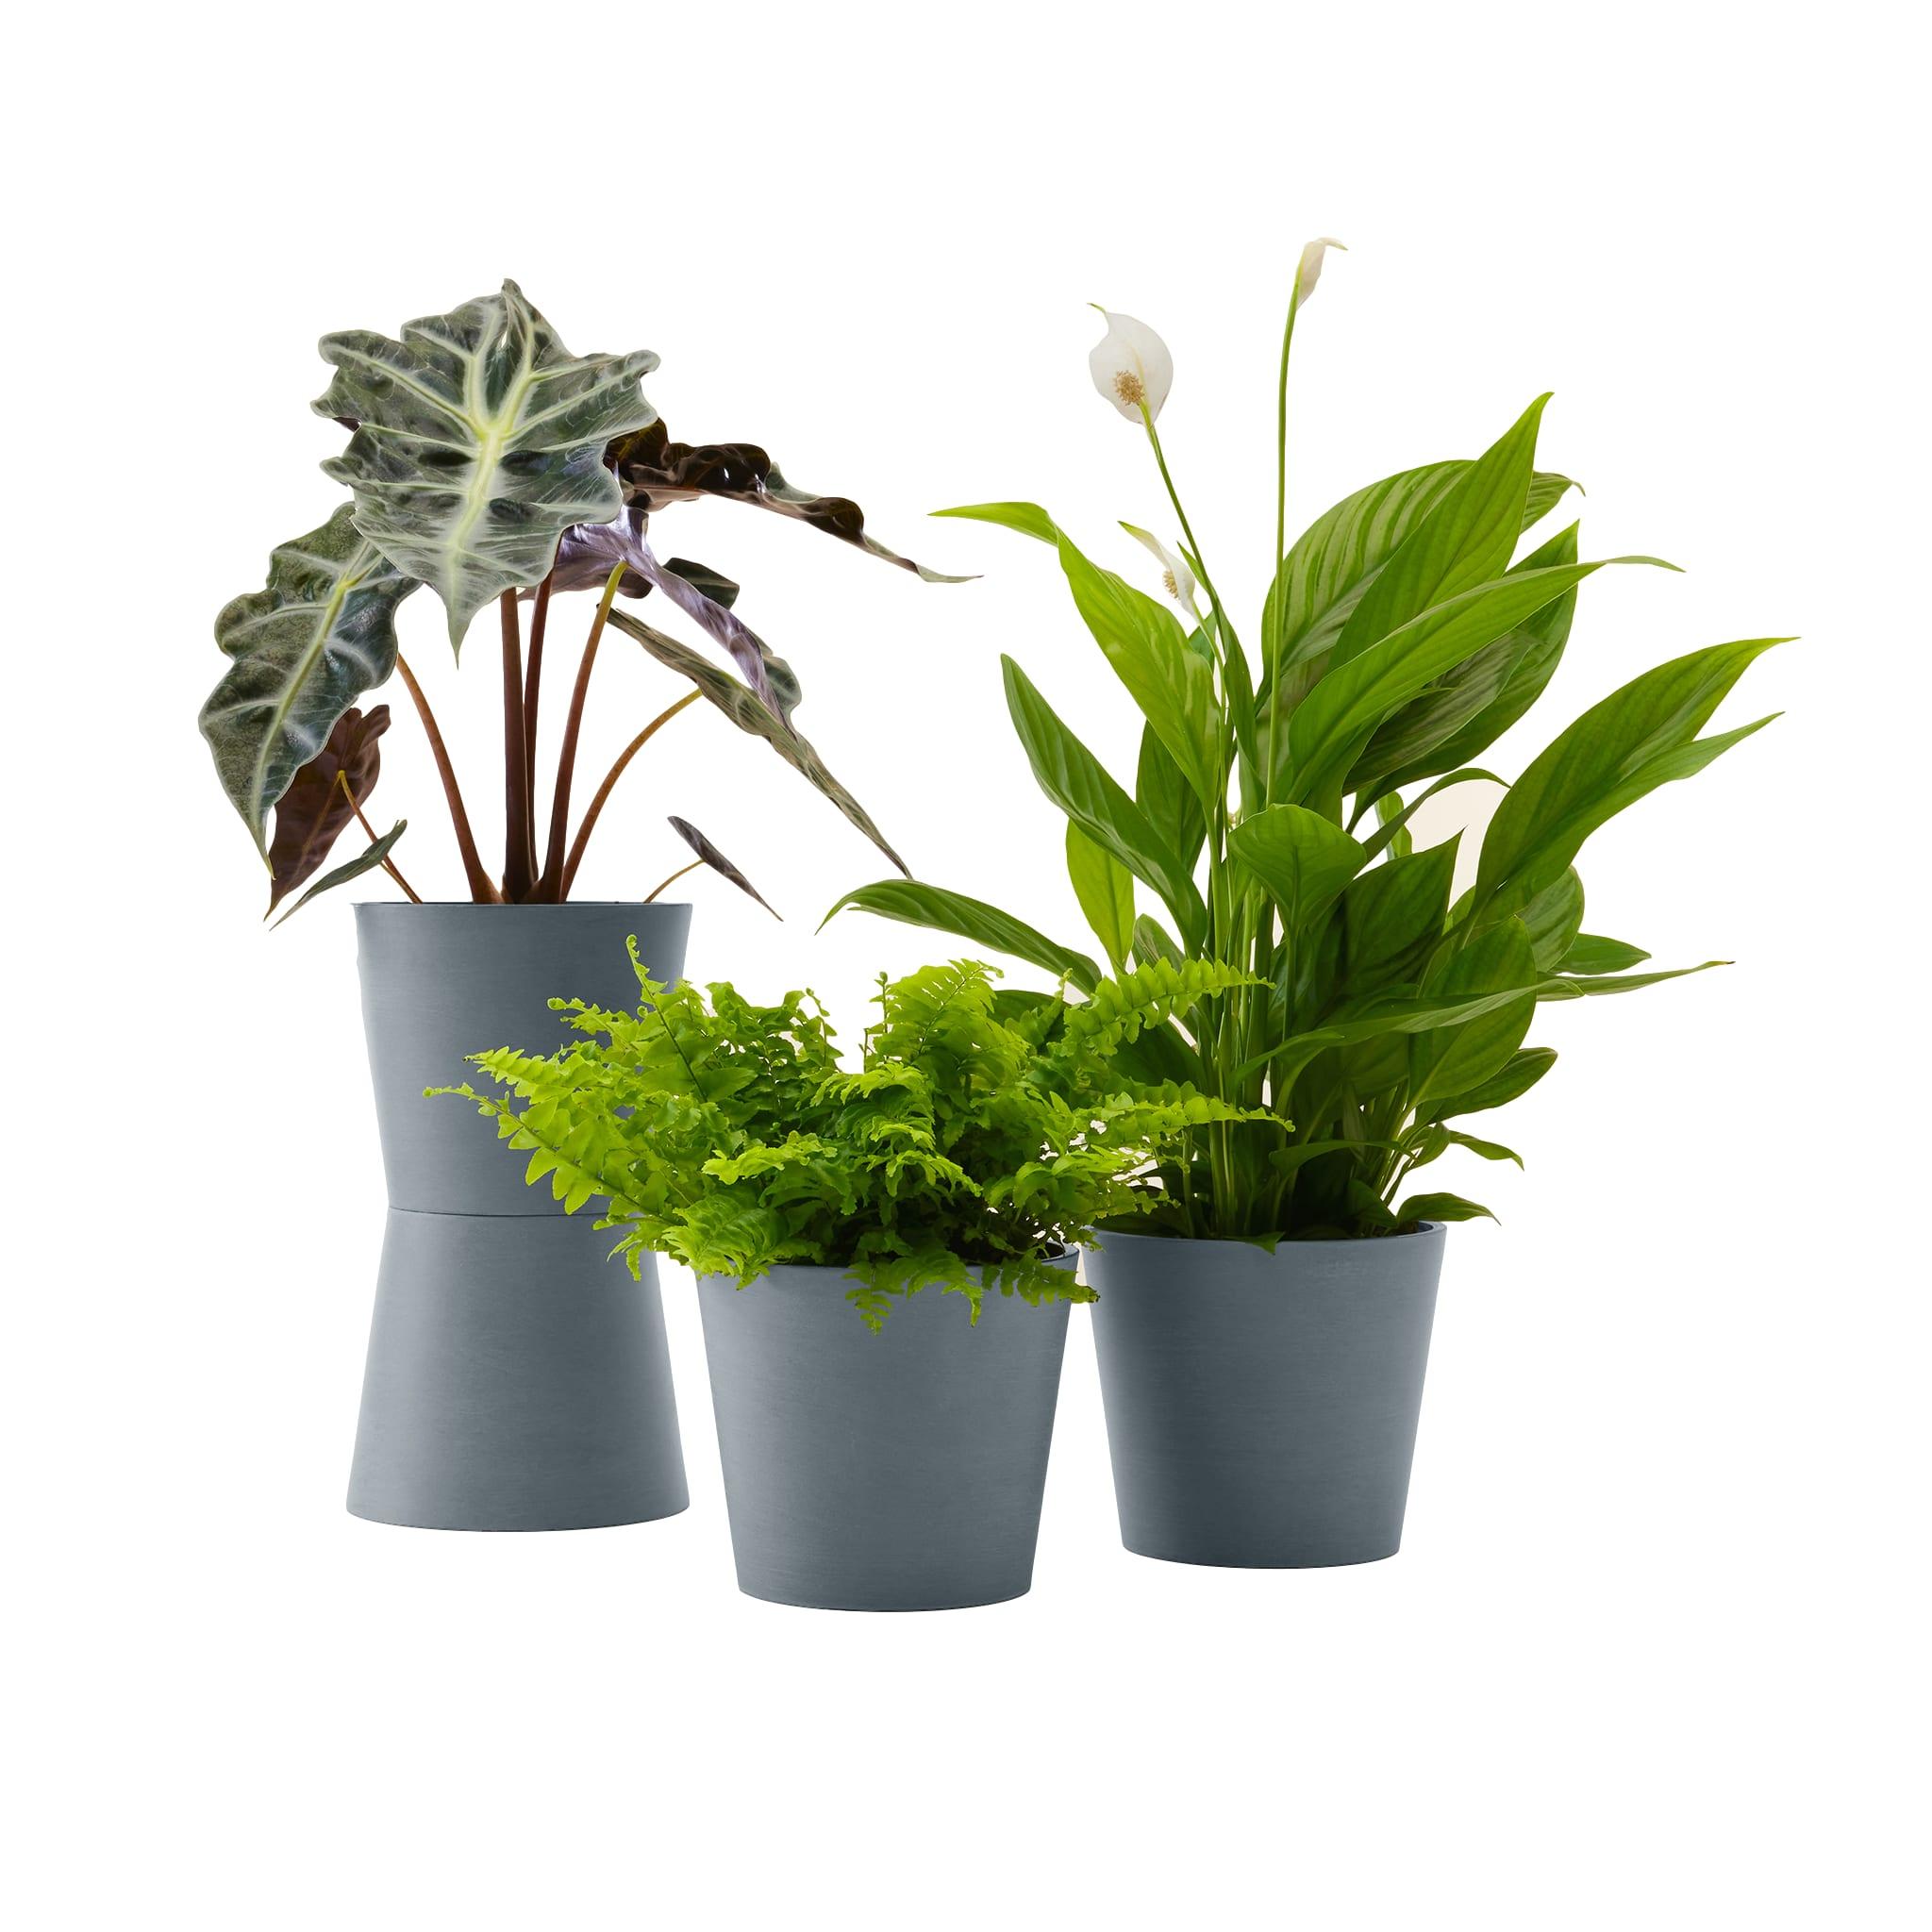 Plante - Spathiphyllum, Bananier, Nephrolepis pot bleu gris